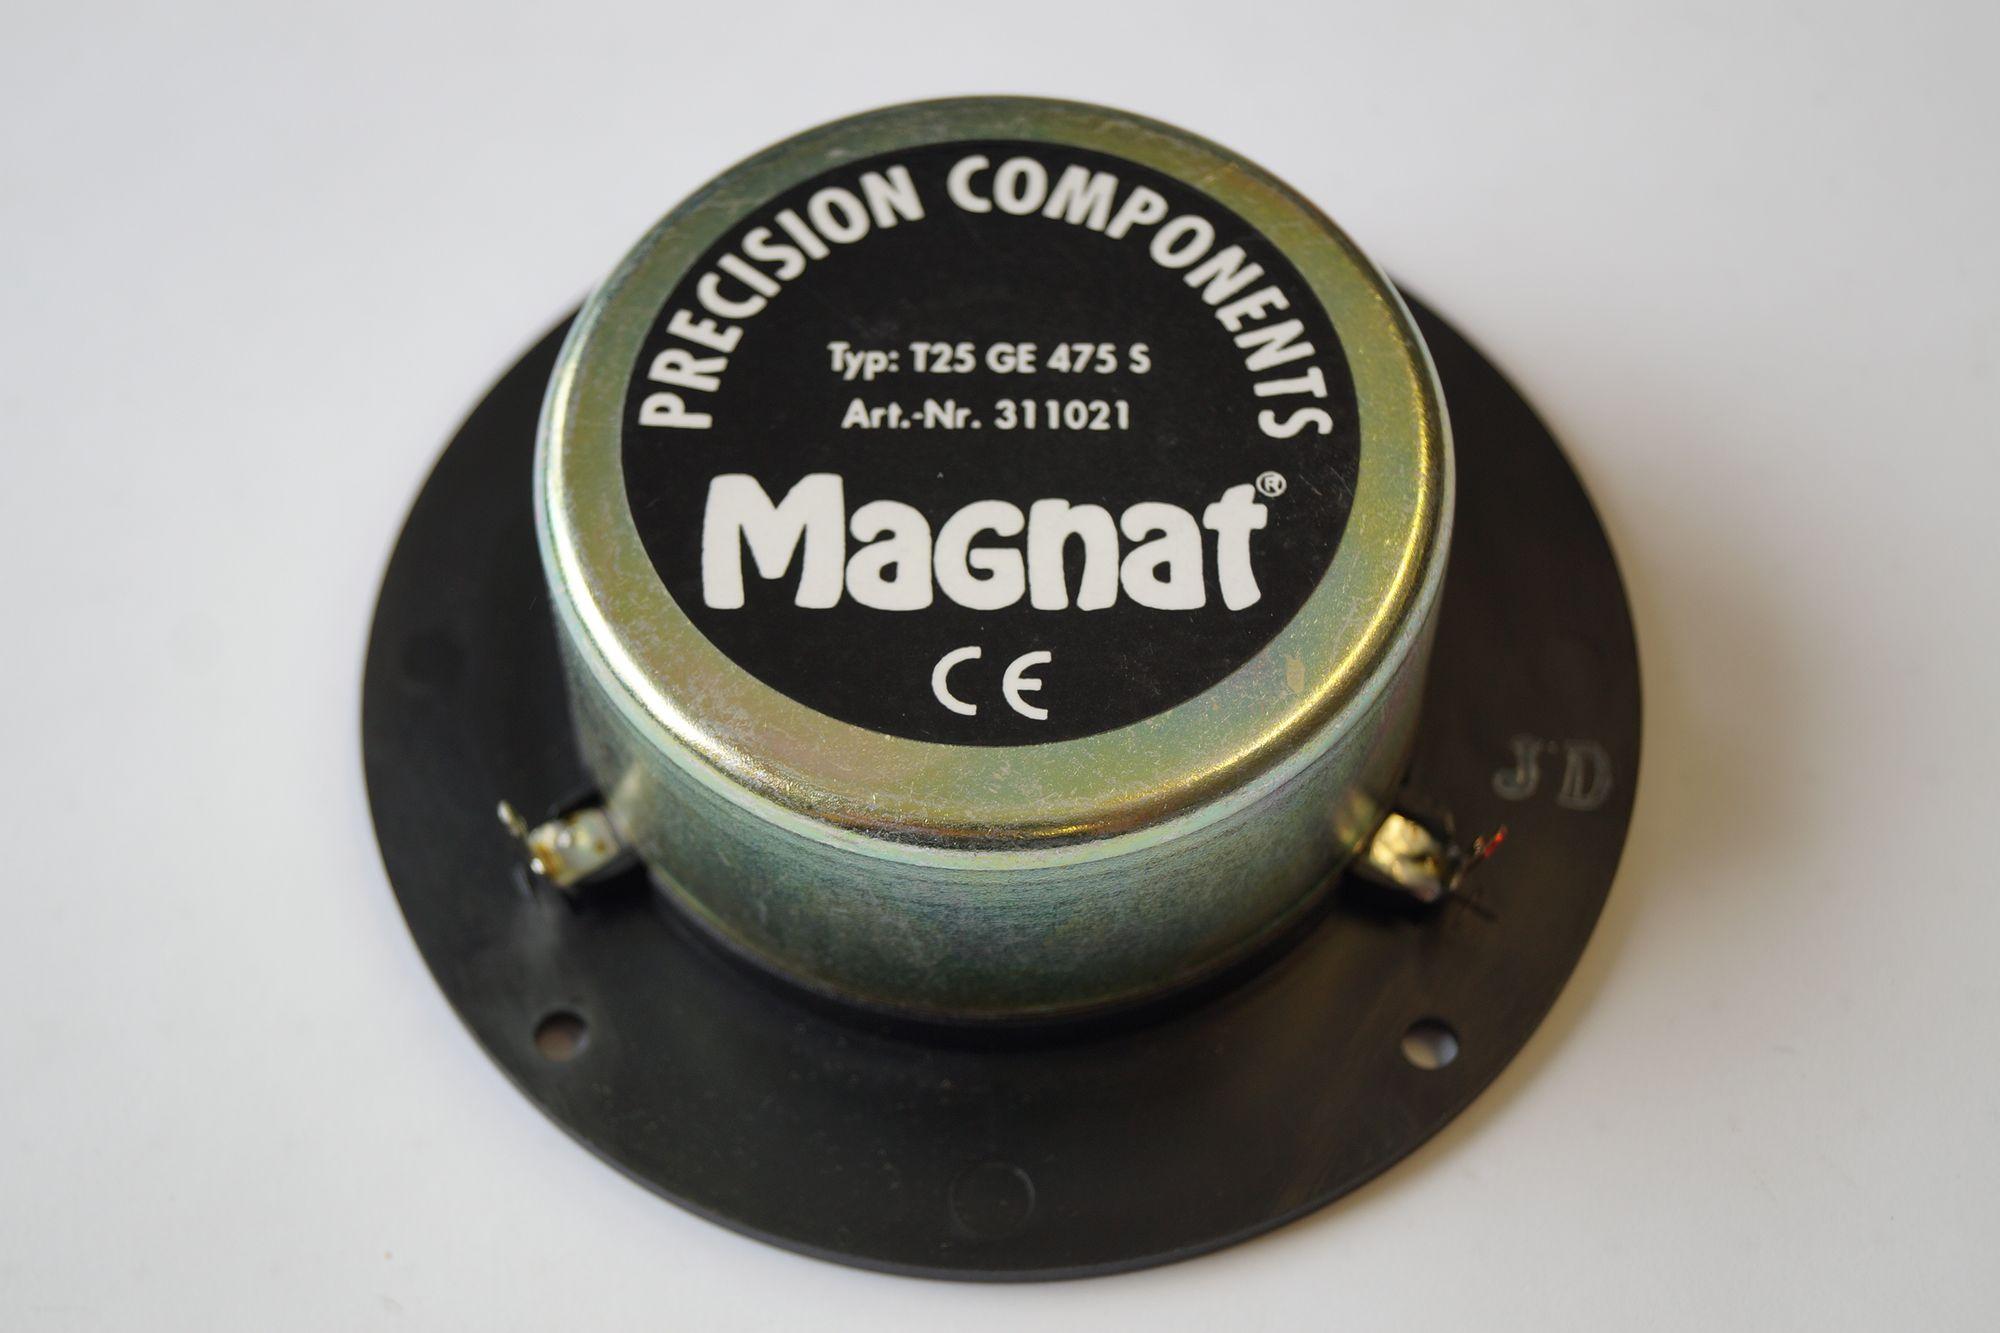 1 Stück Magnat Precision Components Hochtöner T25 GE 475 S Neuware – Bild 2